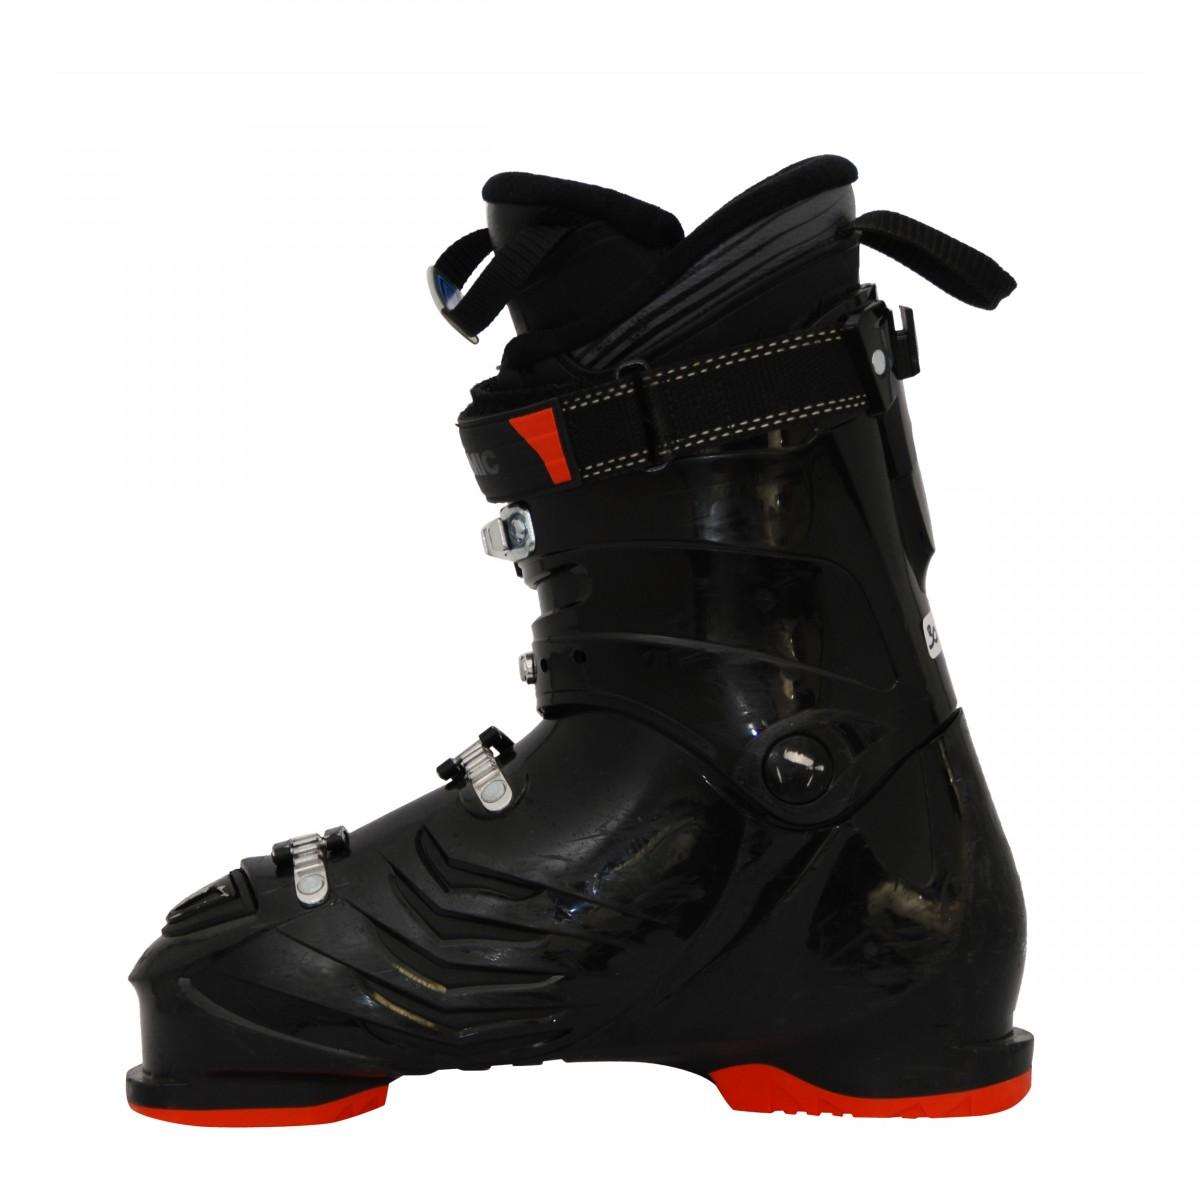 Chaussure-Ski-Occasion-Atomic-Hawx-plus-noir-orange miniature 4